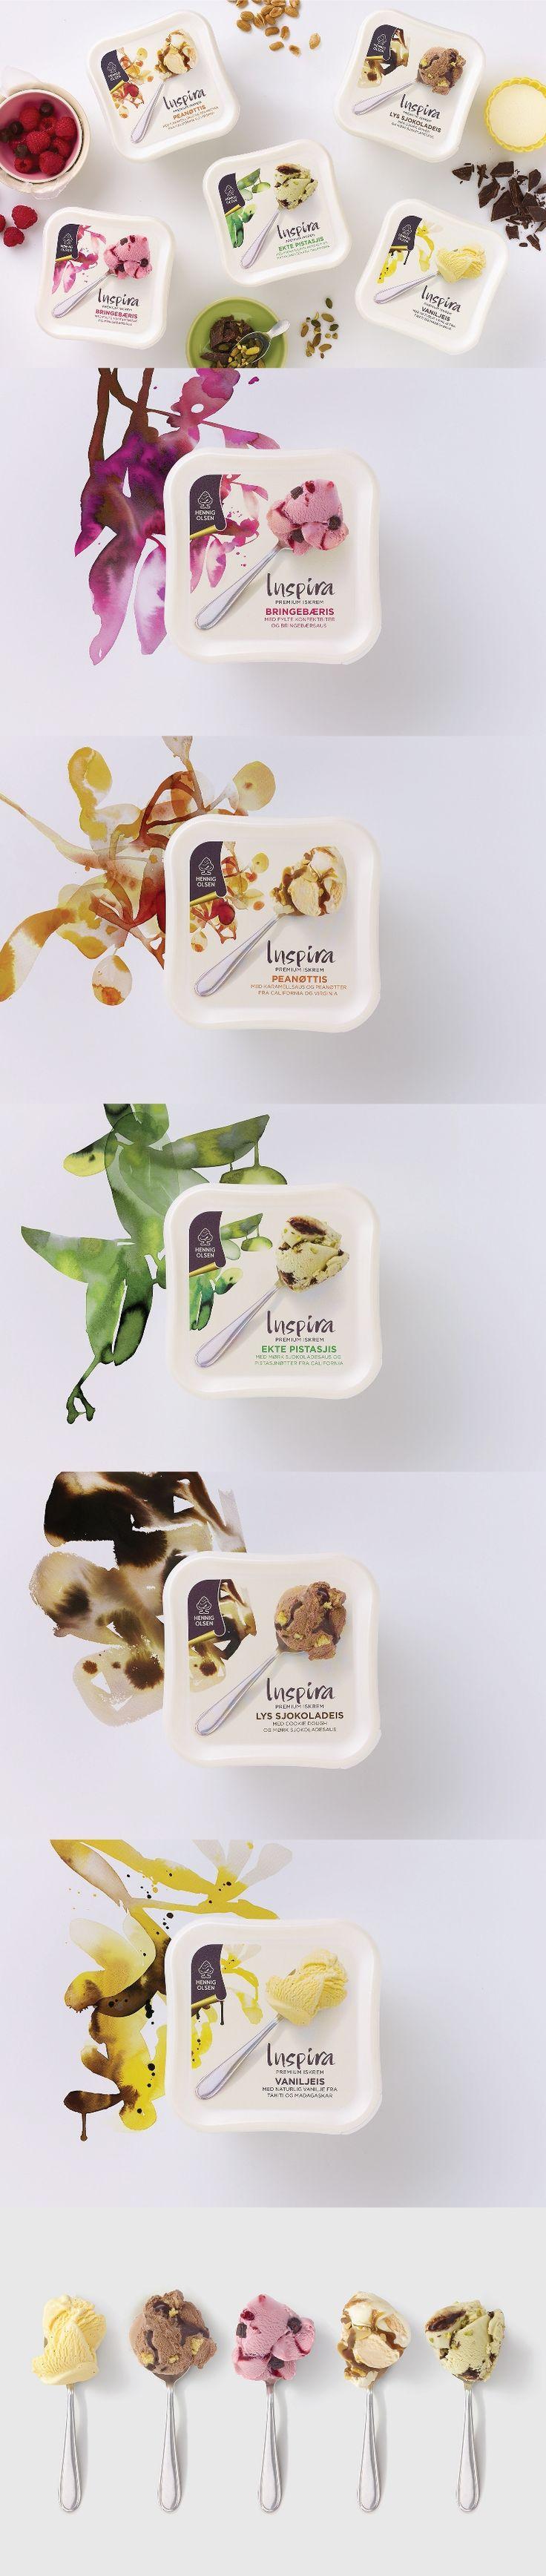 Inspira. The art of ice cream. (More design inspiration at www.aldenchong.com)